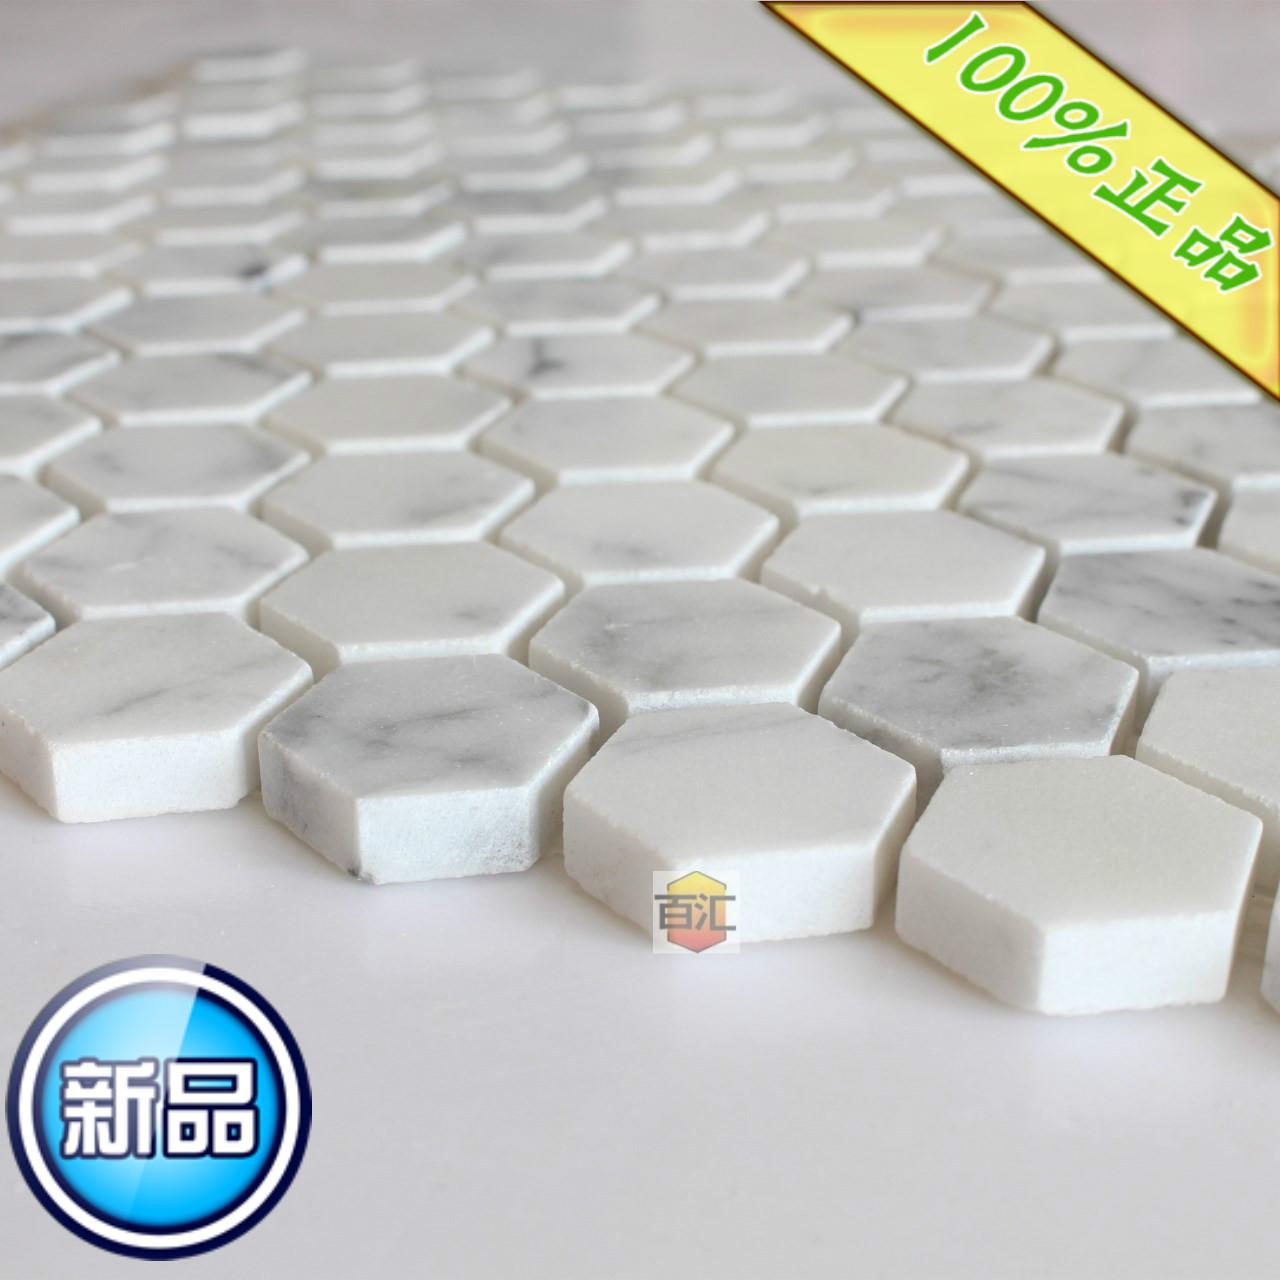 marble-floor-font-b-tiles-b-font-carrara-font-b-white-b-font-mosaic-font-b